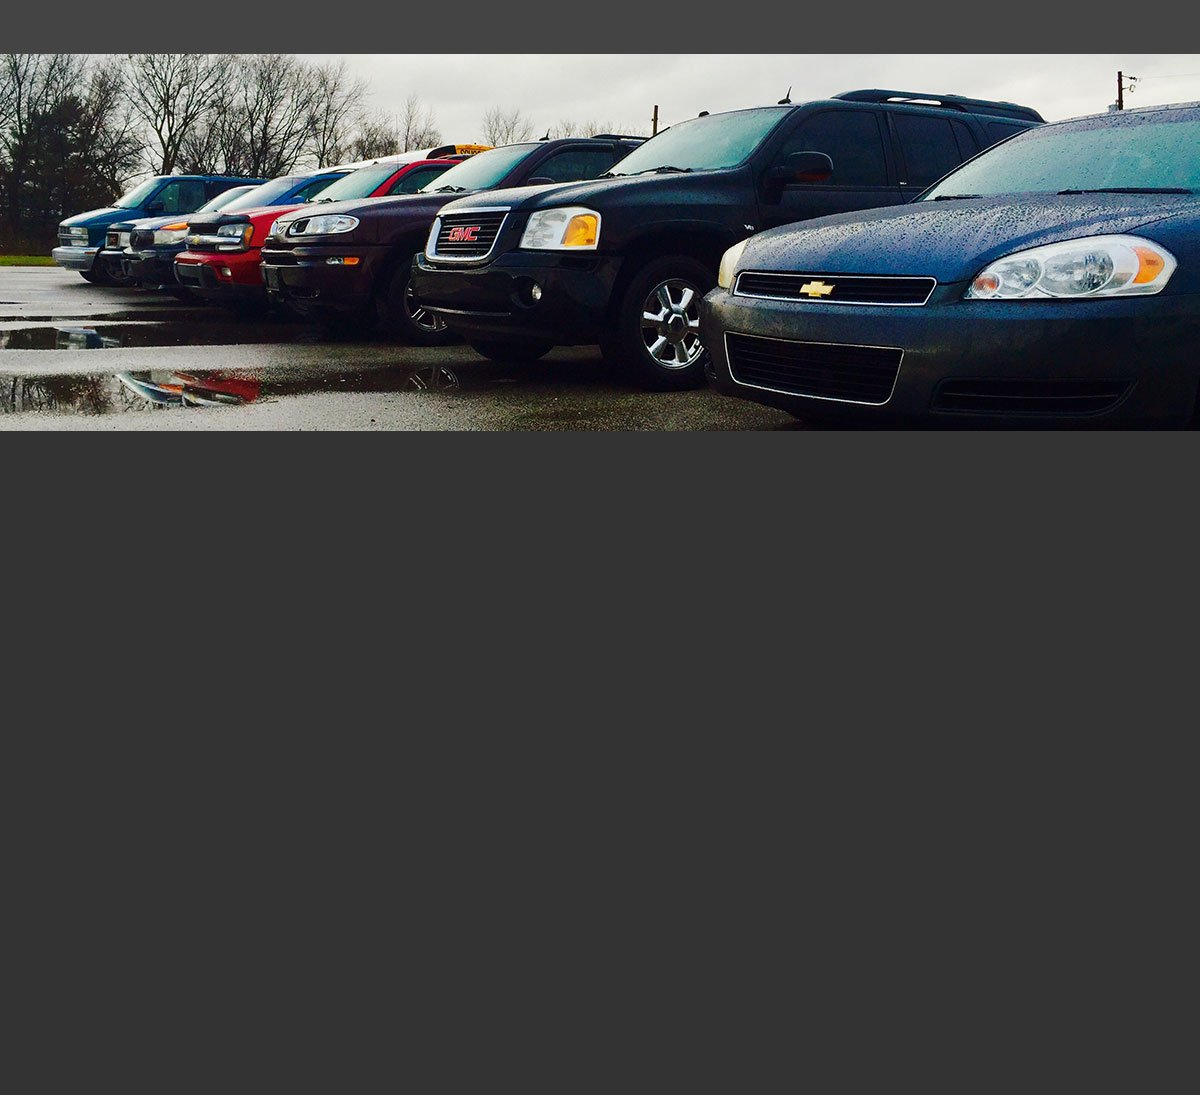 Toyota Of Reading Pa: Union Street Auto Sales